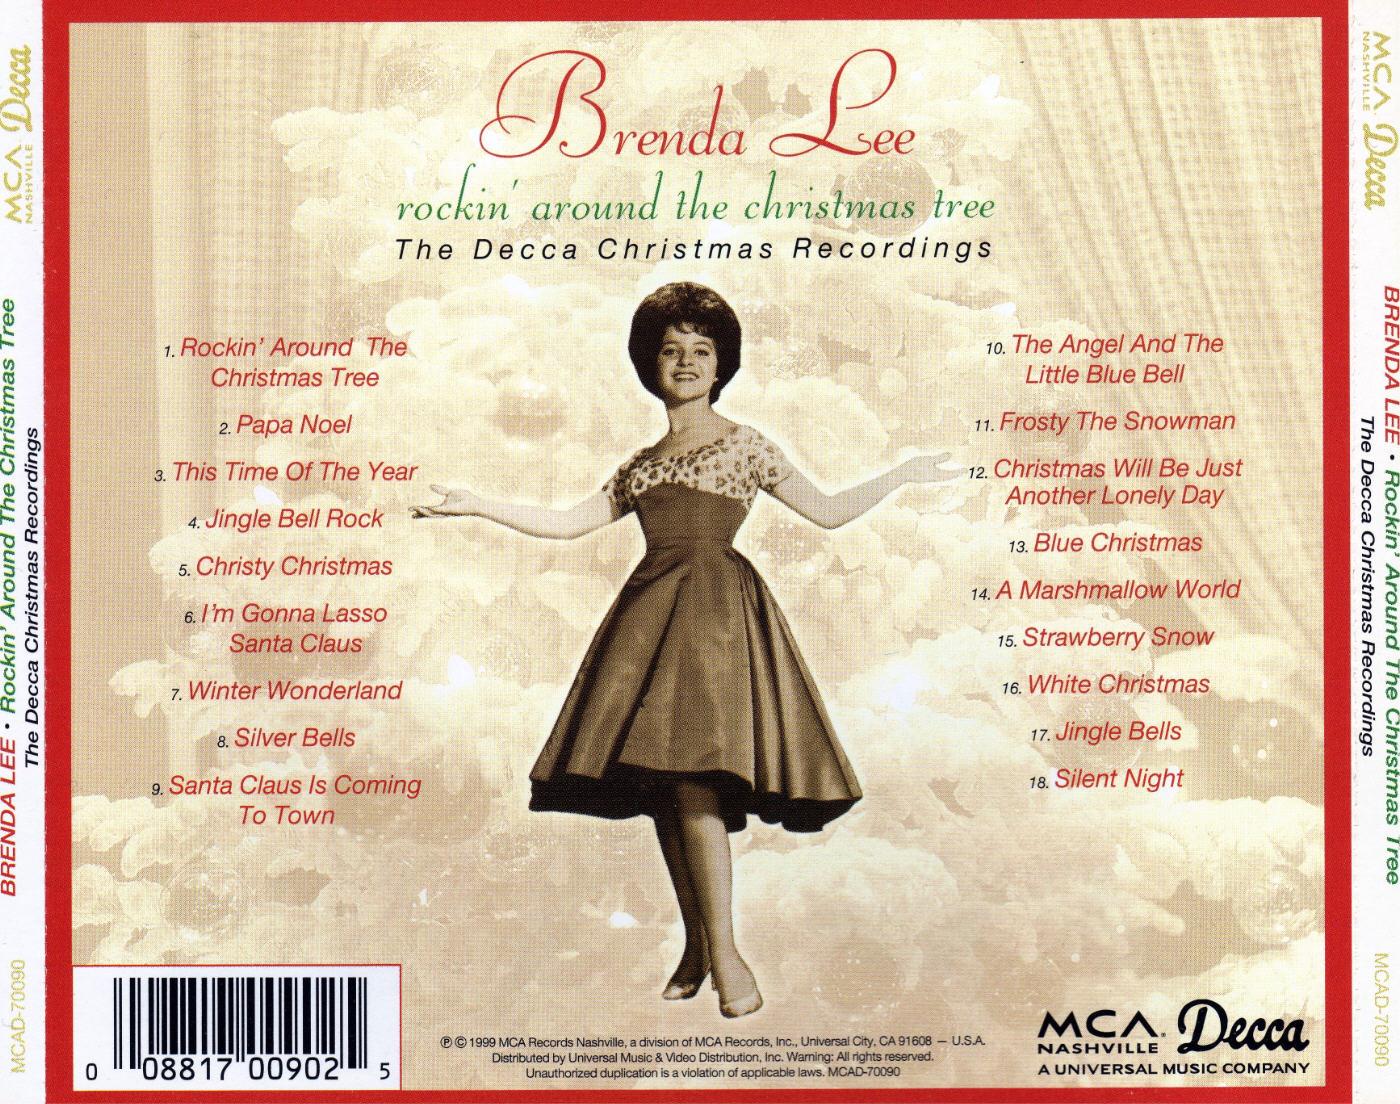 Music Archive: Brenda Lee - Rockin' Around the Christmas Tree